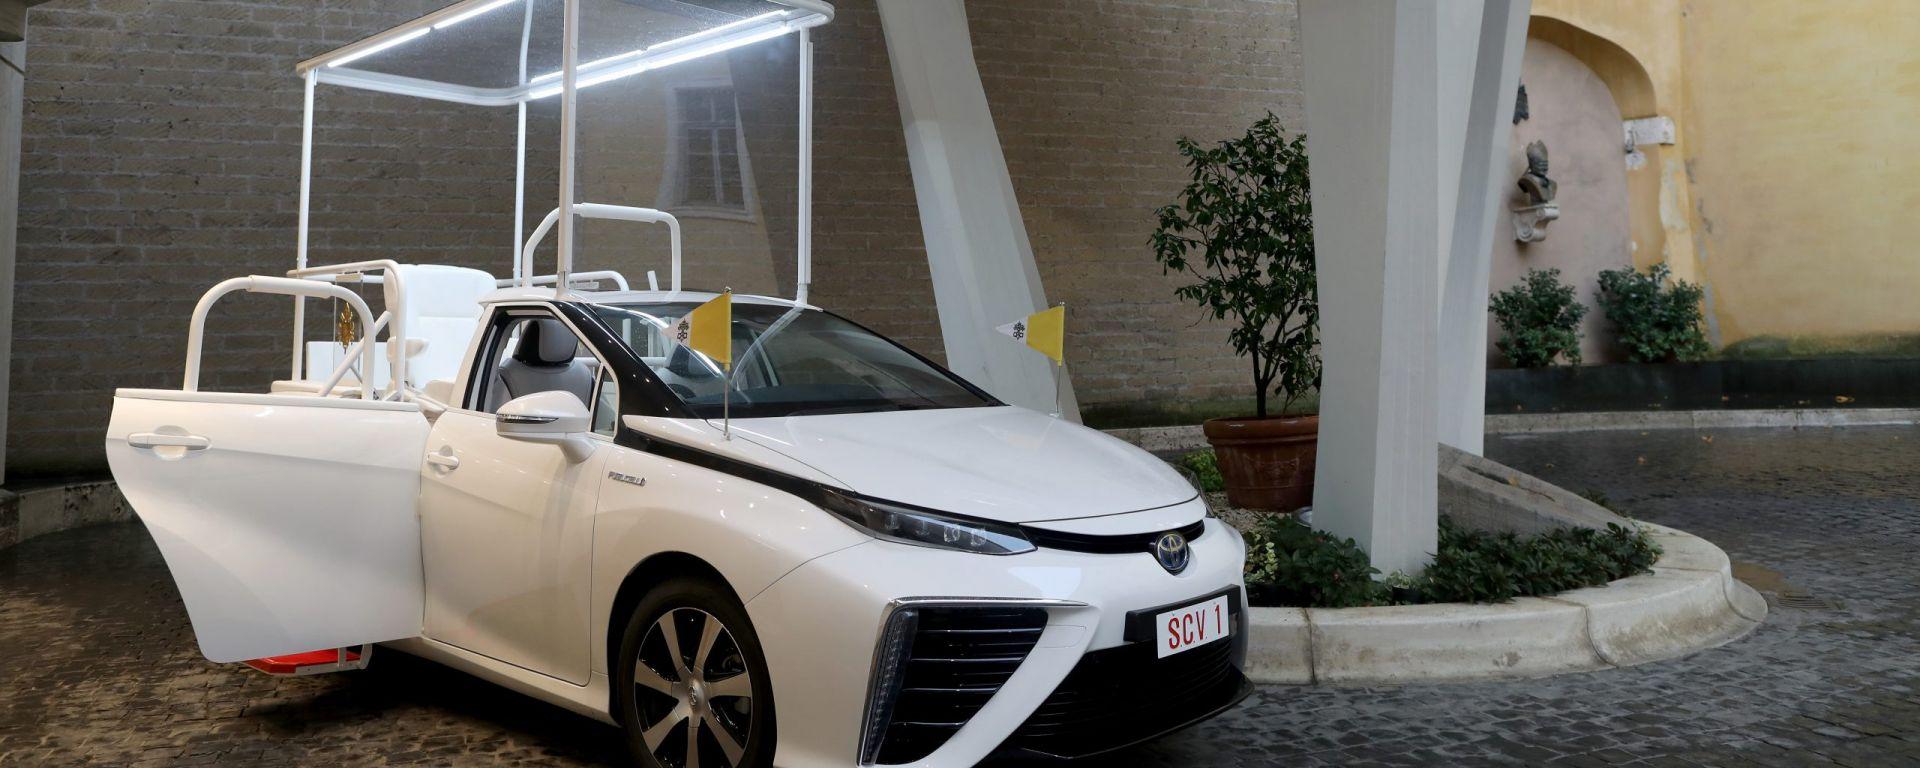 Toyota Mirai: una papamobile a idrogeno per Papa Francesco